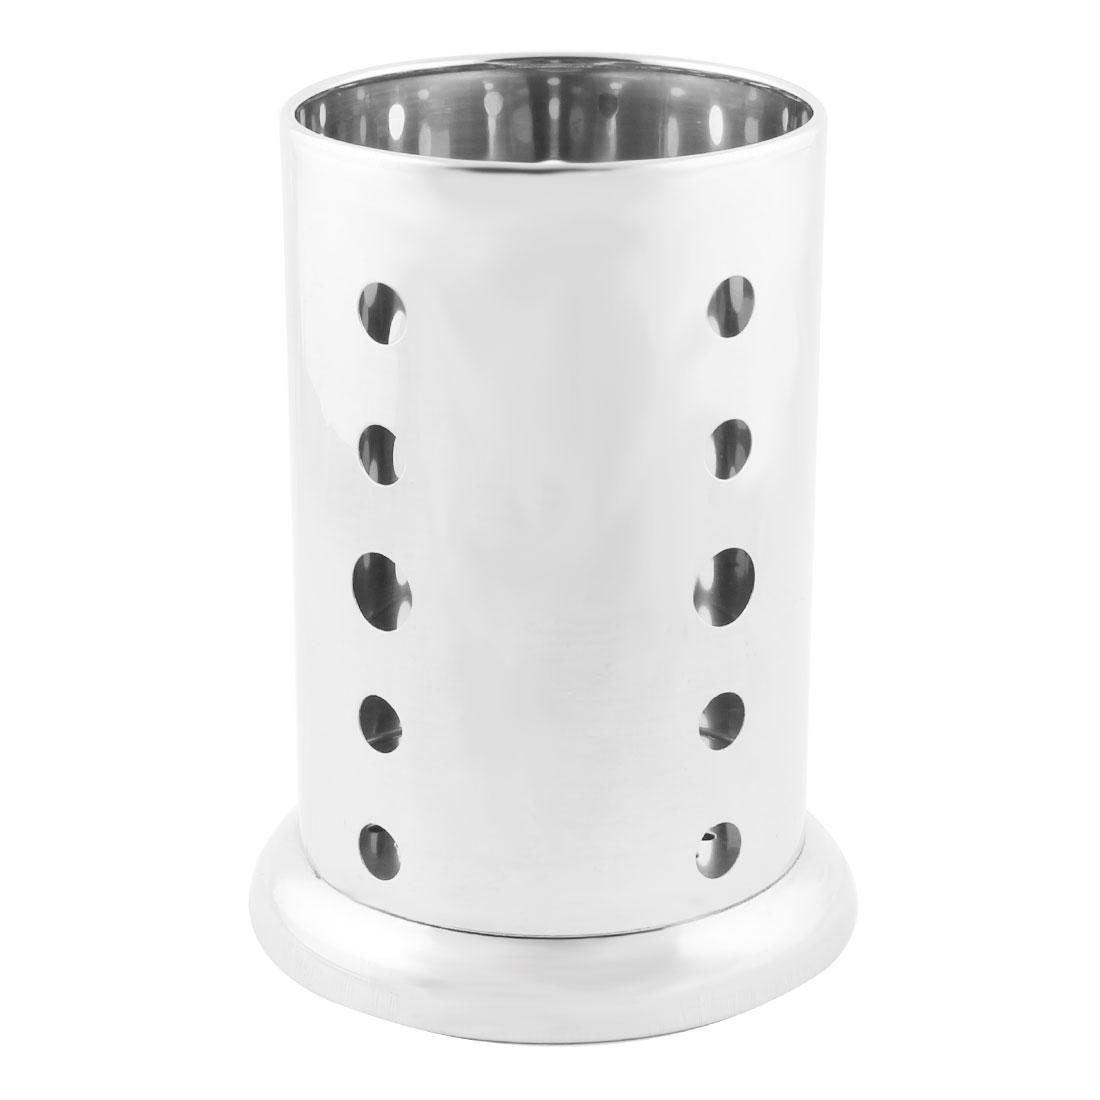 Home Kitchen Stainless Steel Hollow Bottom Spoon Fork Chopsticks Holder Case Cage 13 x 17cm